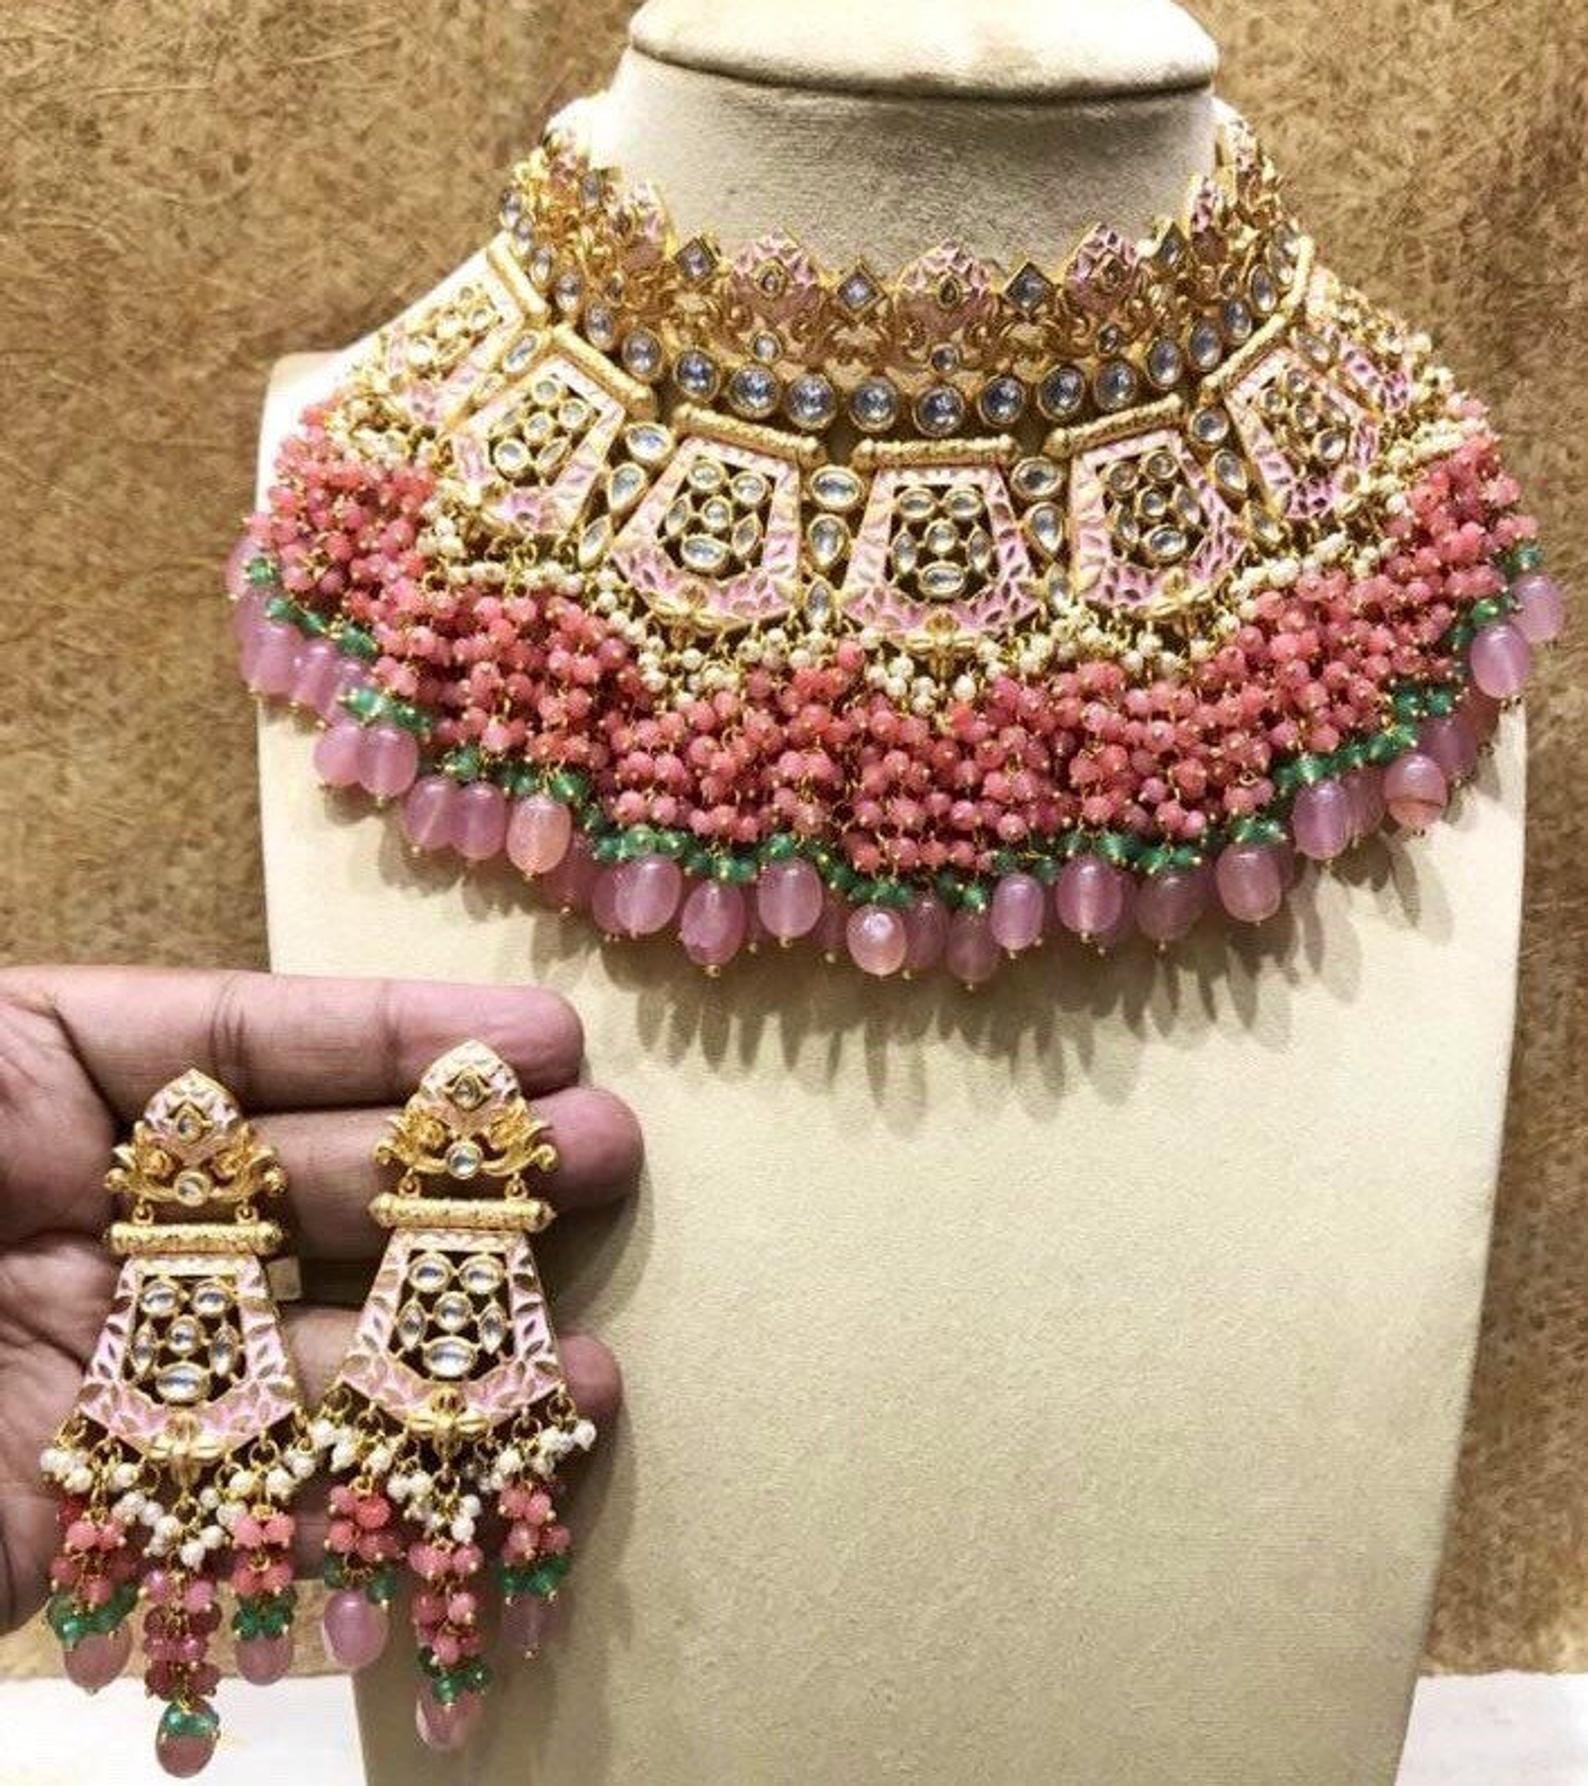 Choker Bollywood Wedding Party Jewelry Set Elegant Desing Meena Kundan Jewelry Handmade Choker Necklace Earrings Set White